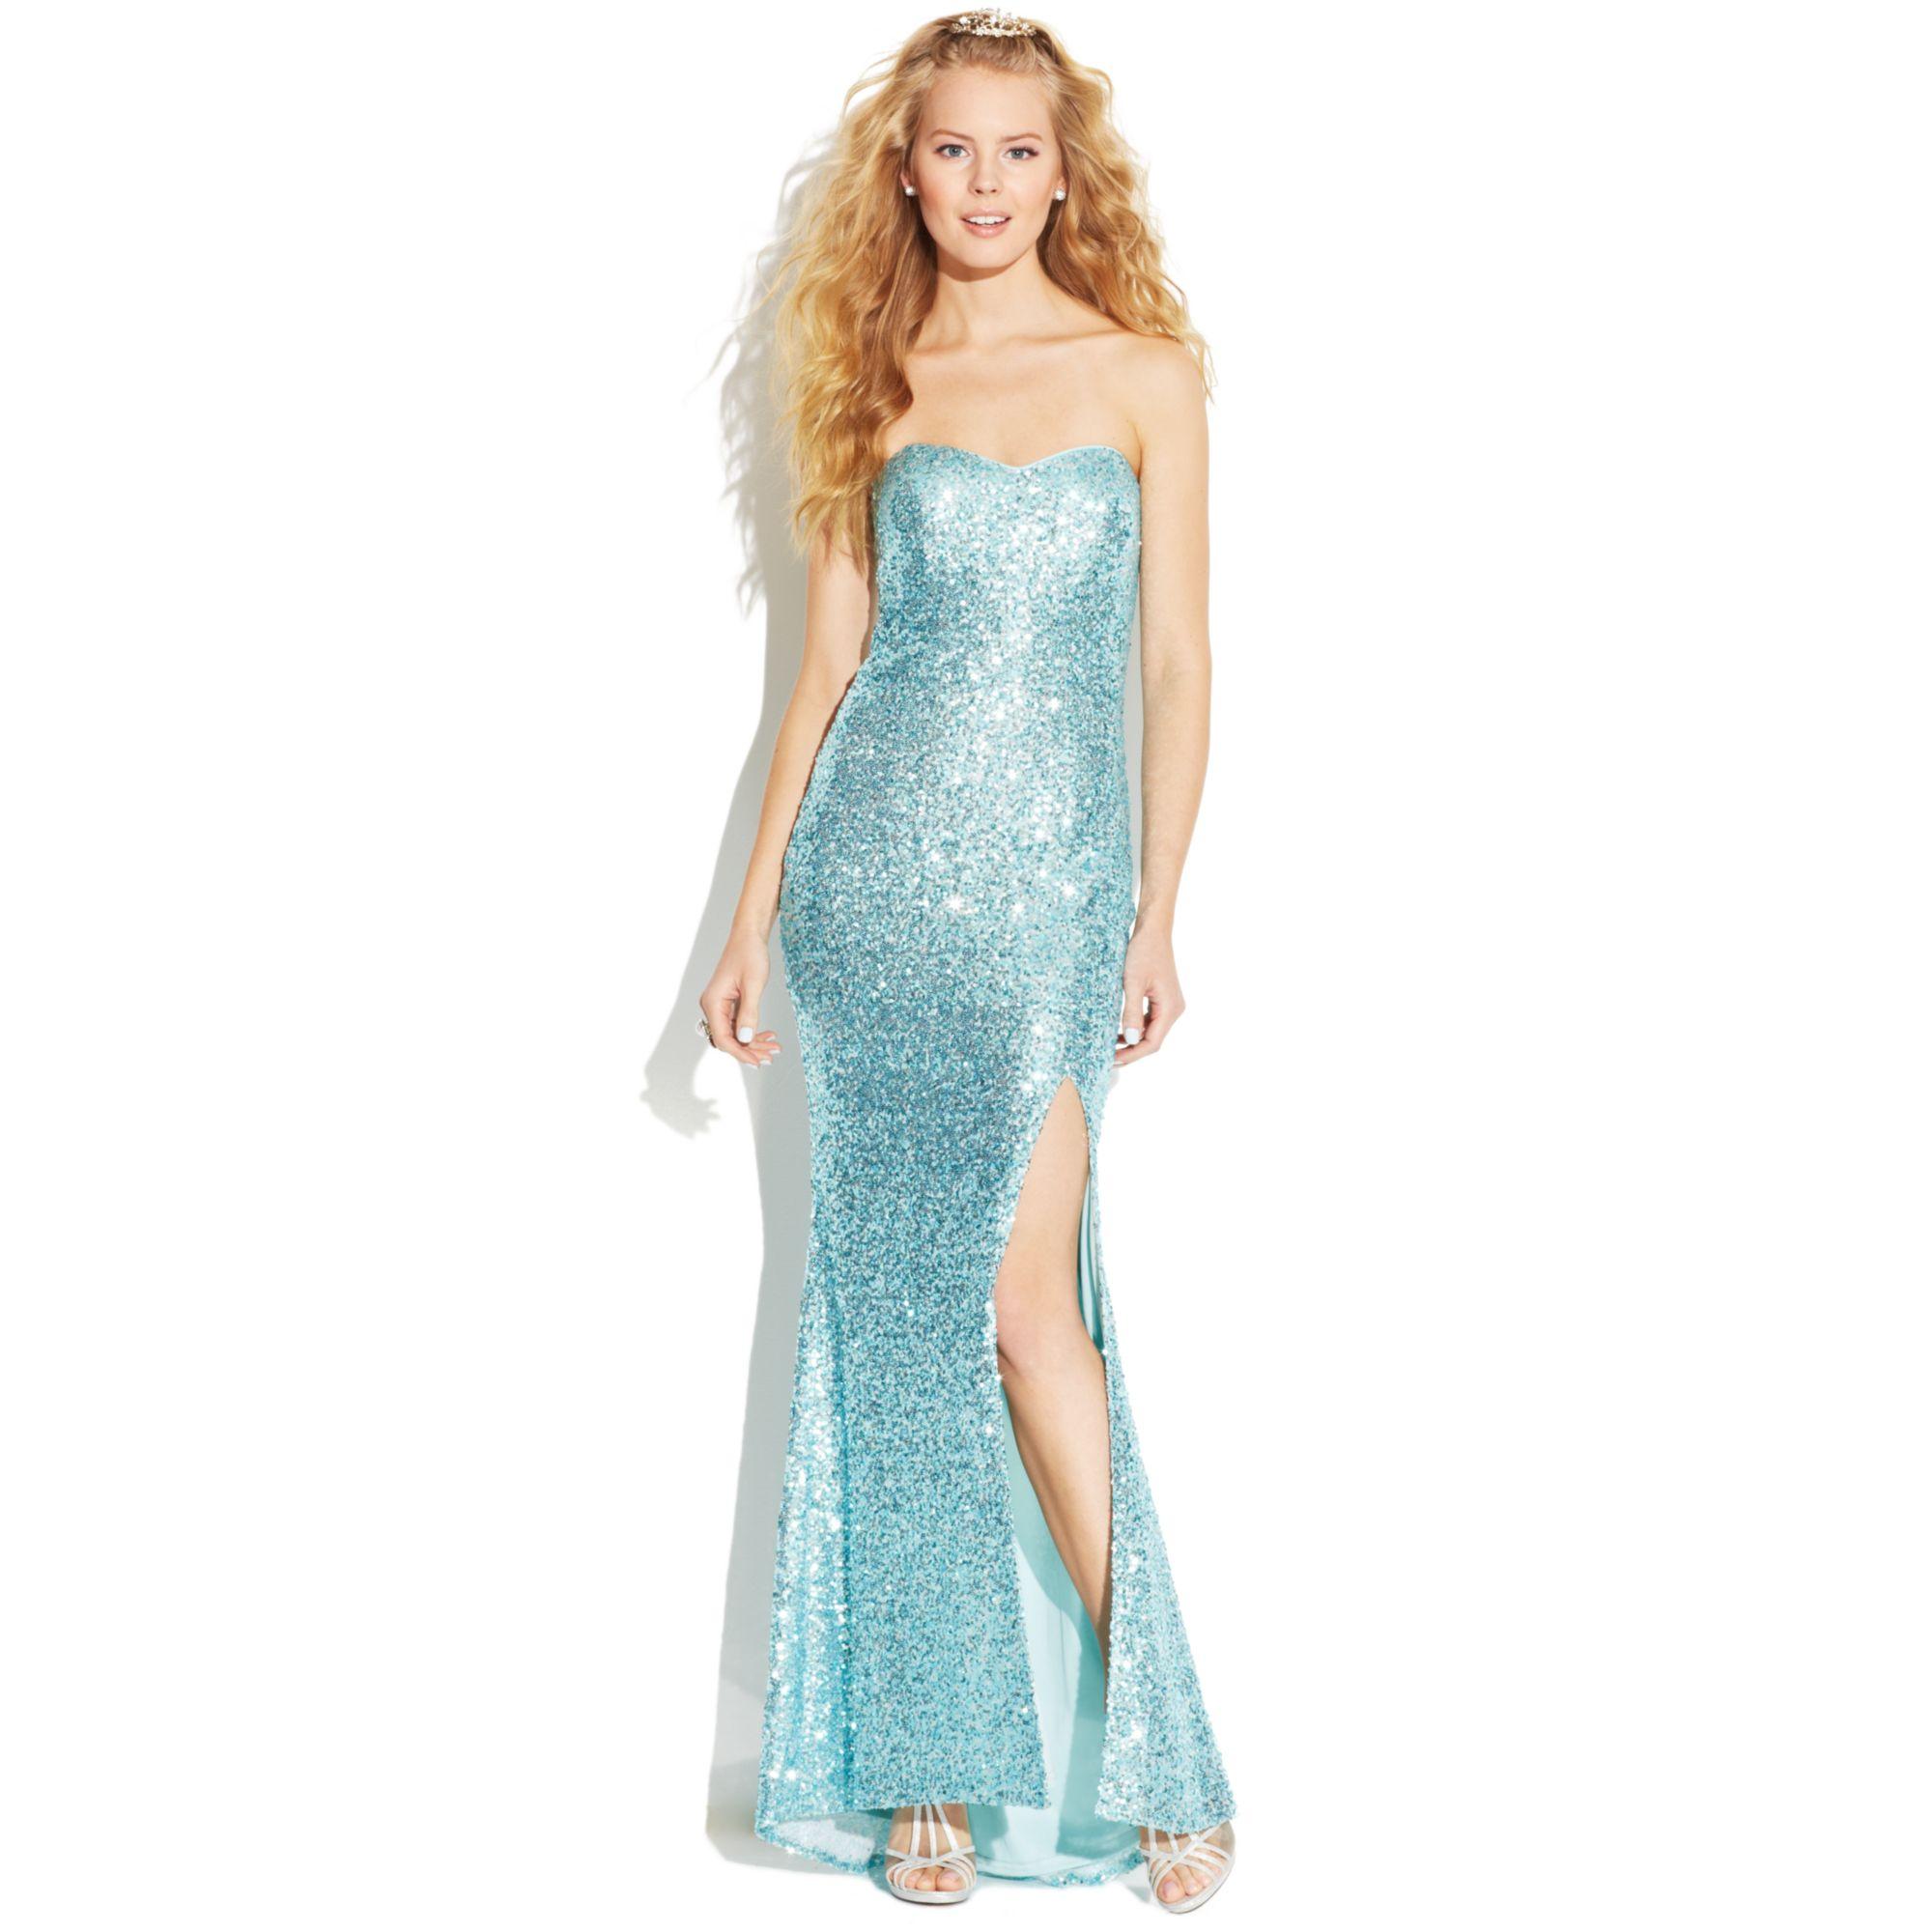 Modern Macys Dresses For Weddings Frieze - All Wedding Dresses ...